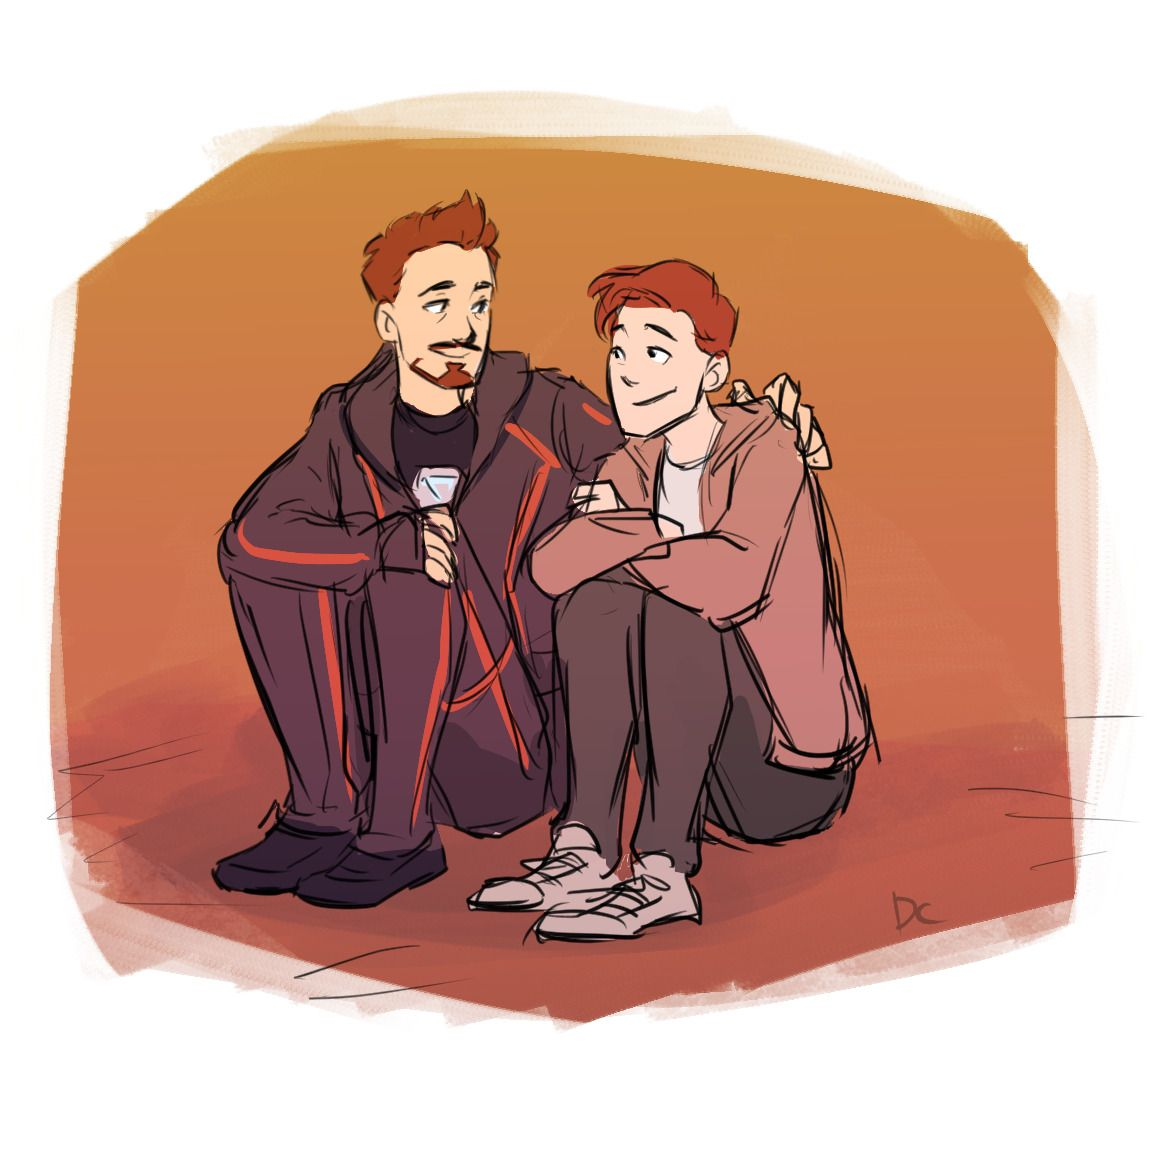 Avengers Infinity War Tony Stark Father Peter Parker Son